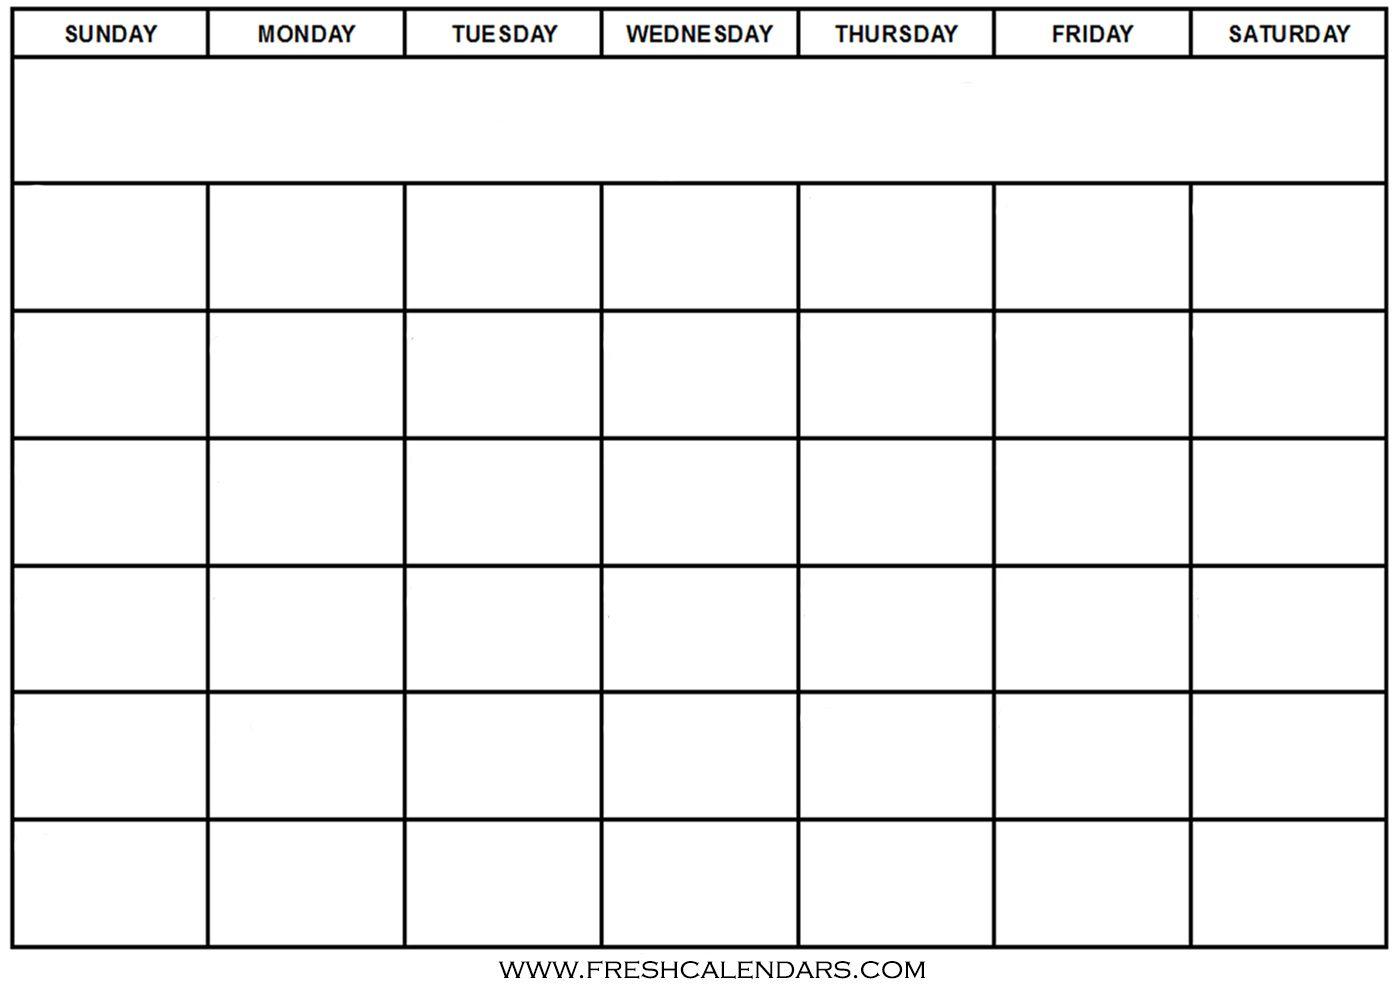 Blank Calendar: Wonderfully Printable 2019 Templates in Free Printable Blank Calendars To Fill In